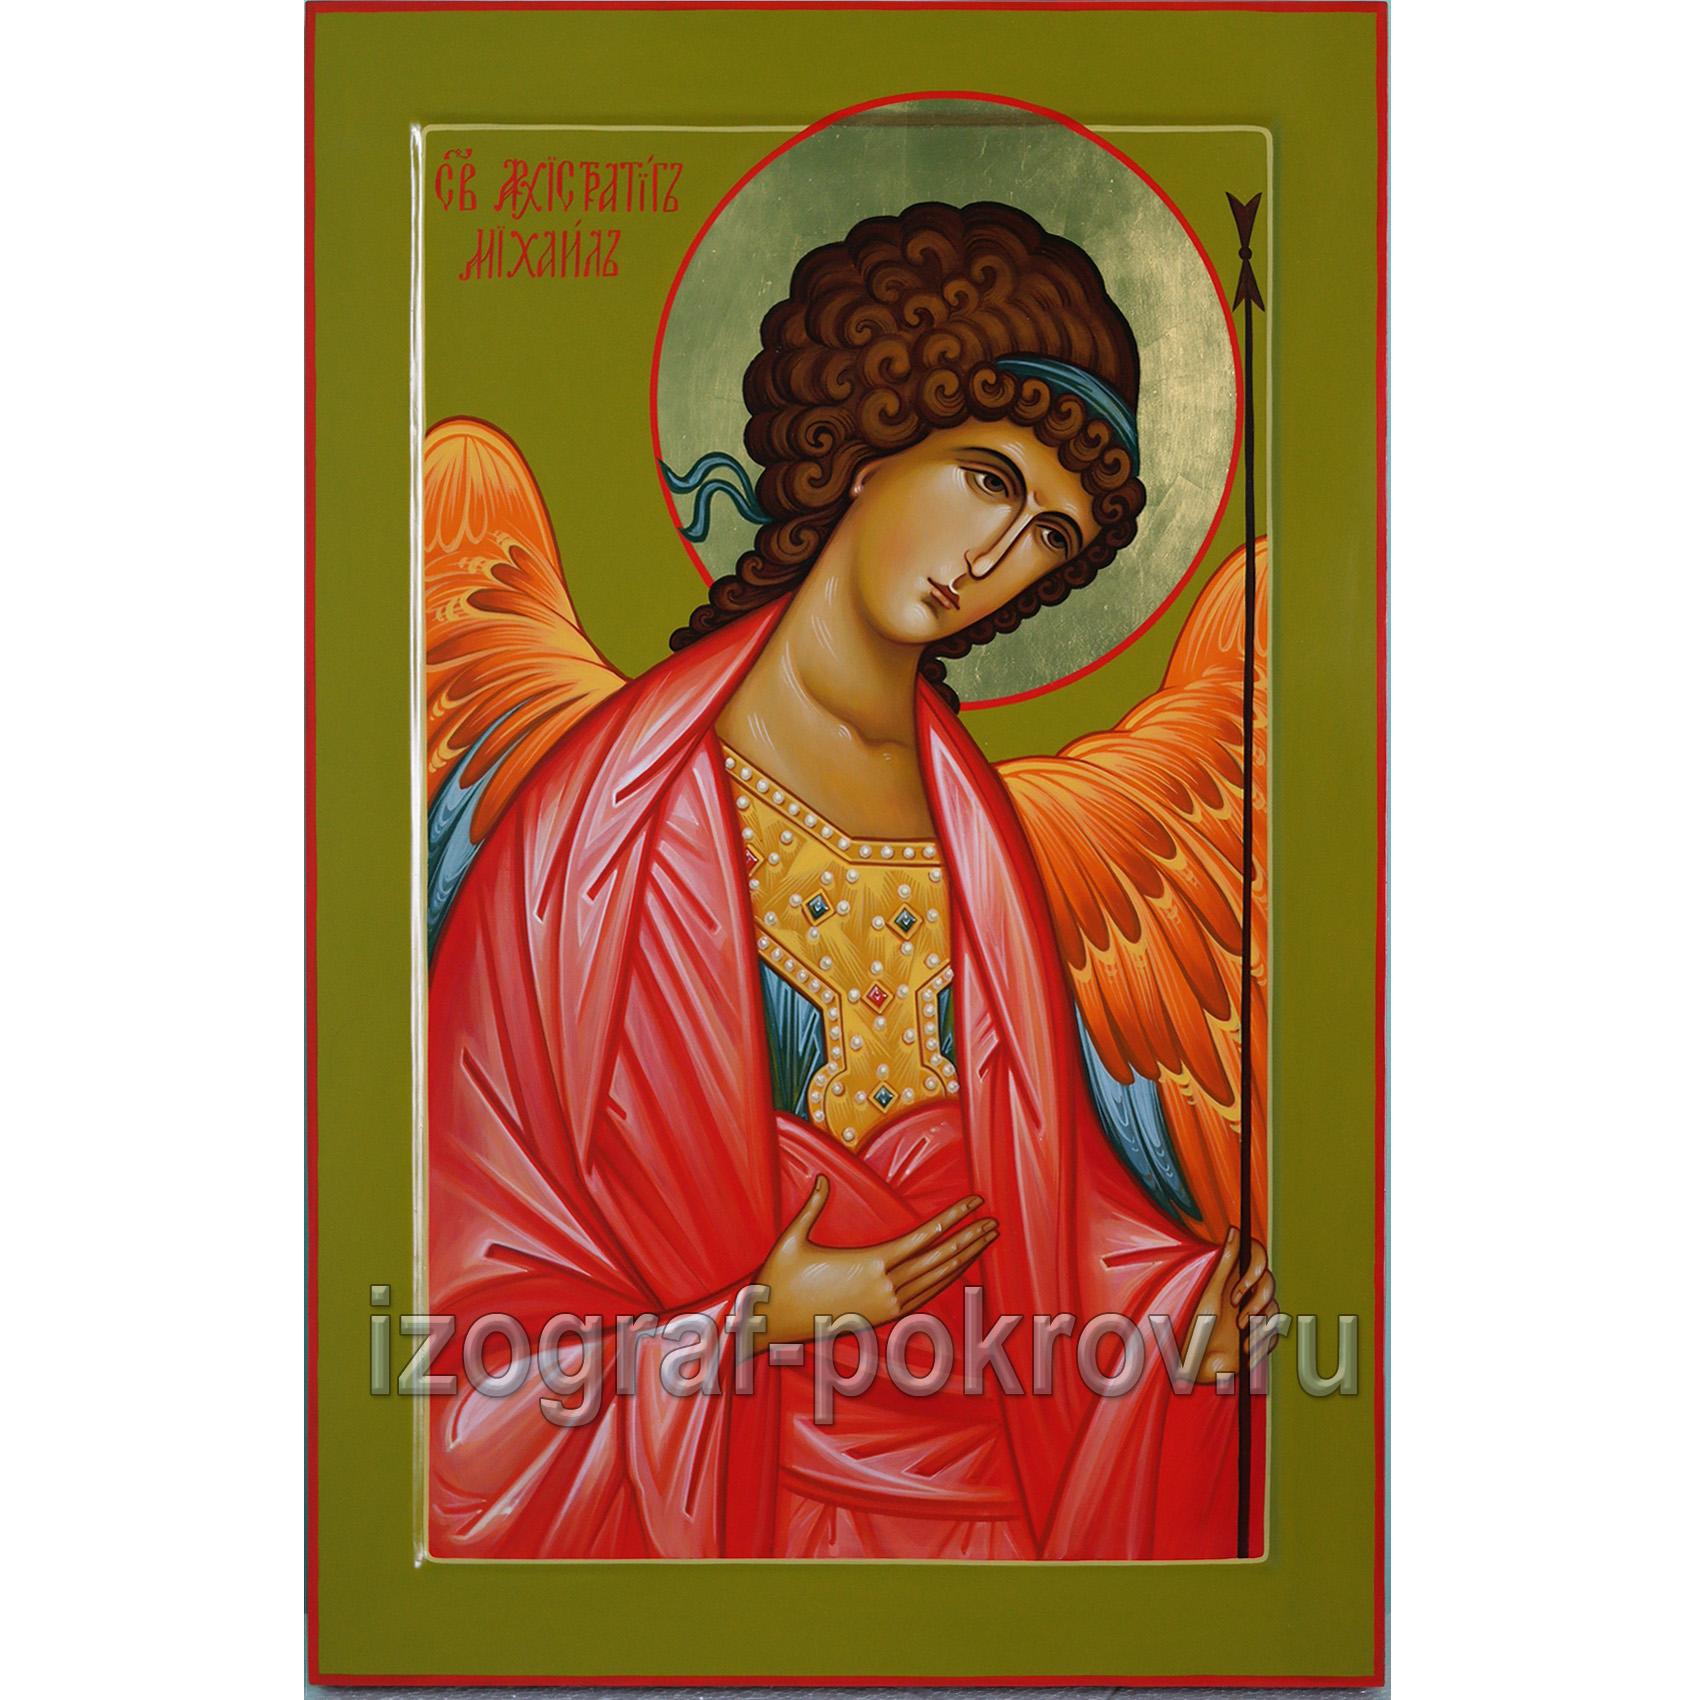 Икона Архангела Архистратига Михаила